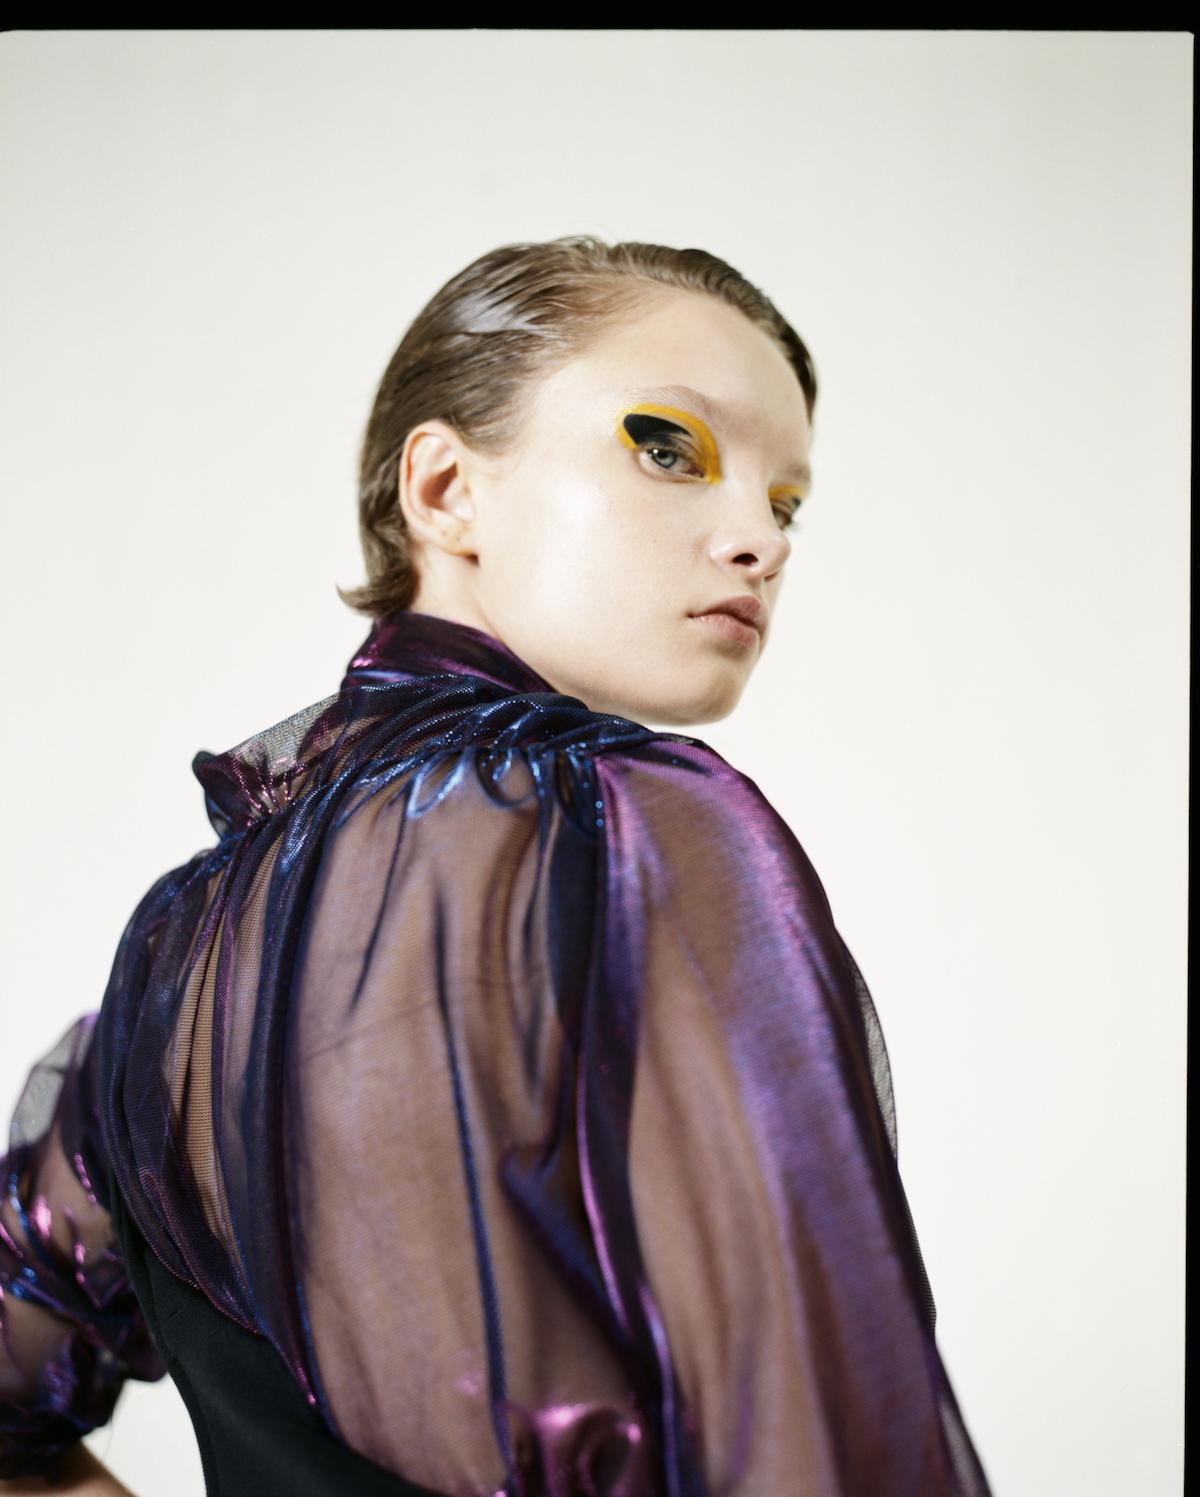 Teeth Magazine Online Mathilda Berns Fashion Film Editorial Ouestmausure